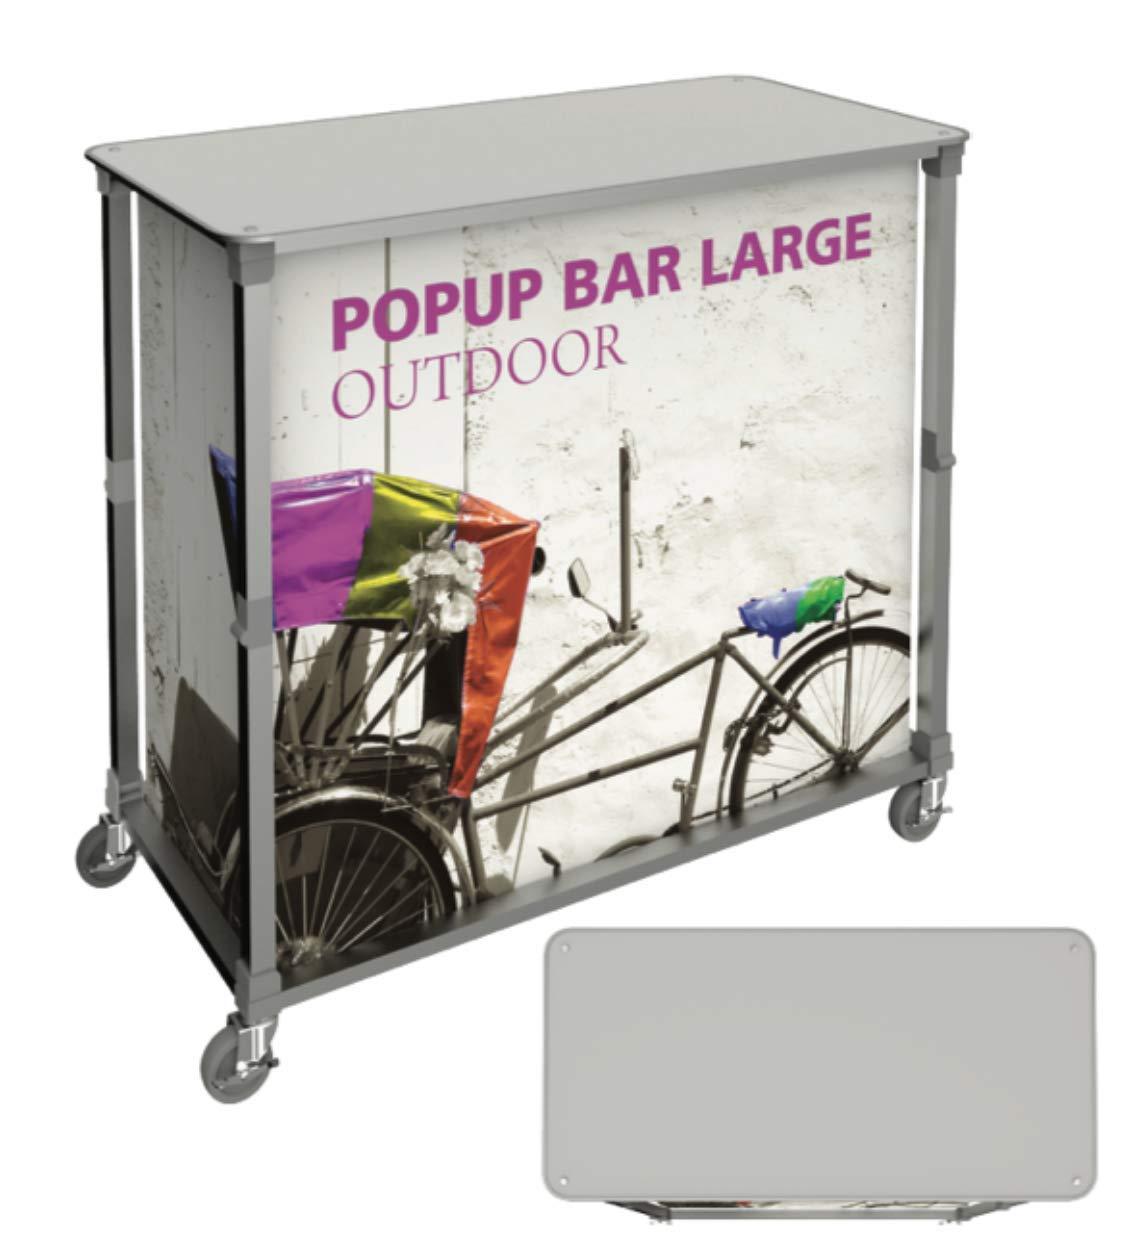 Large Portable Popup Bar